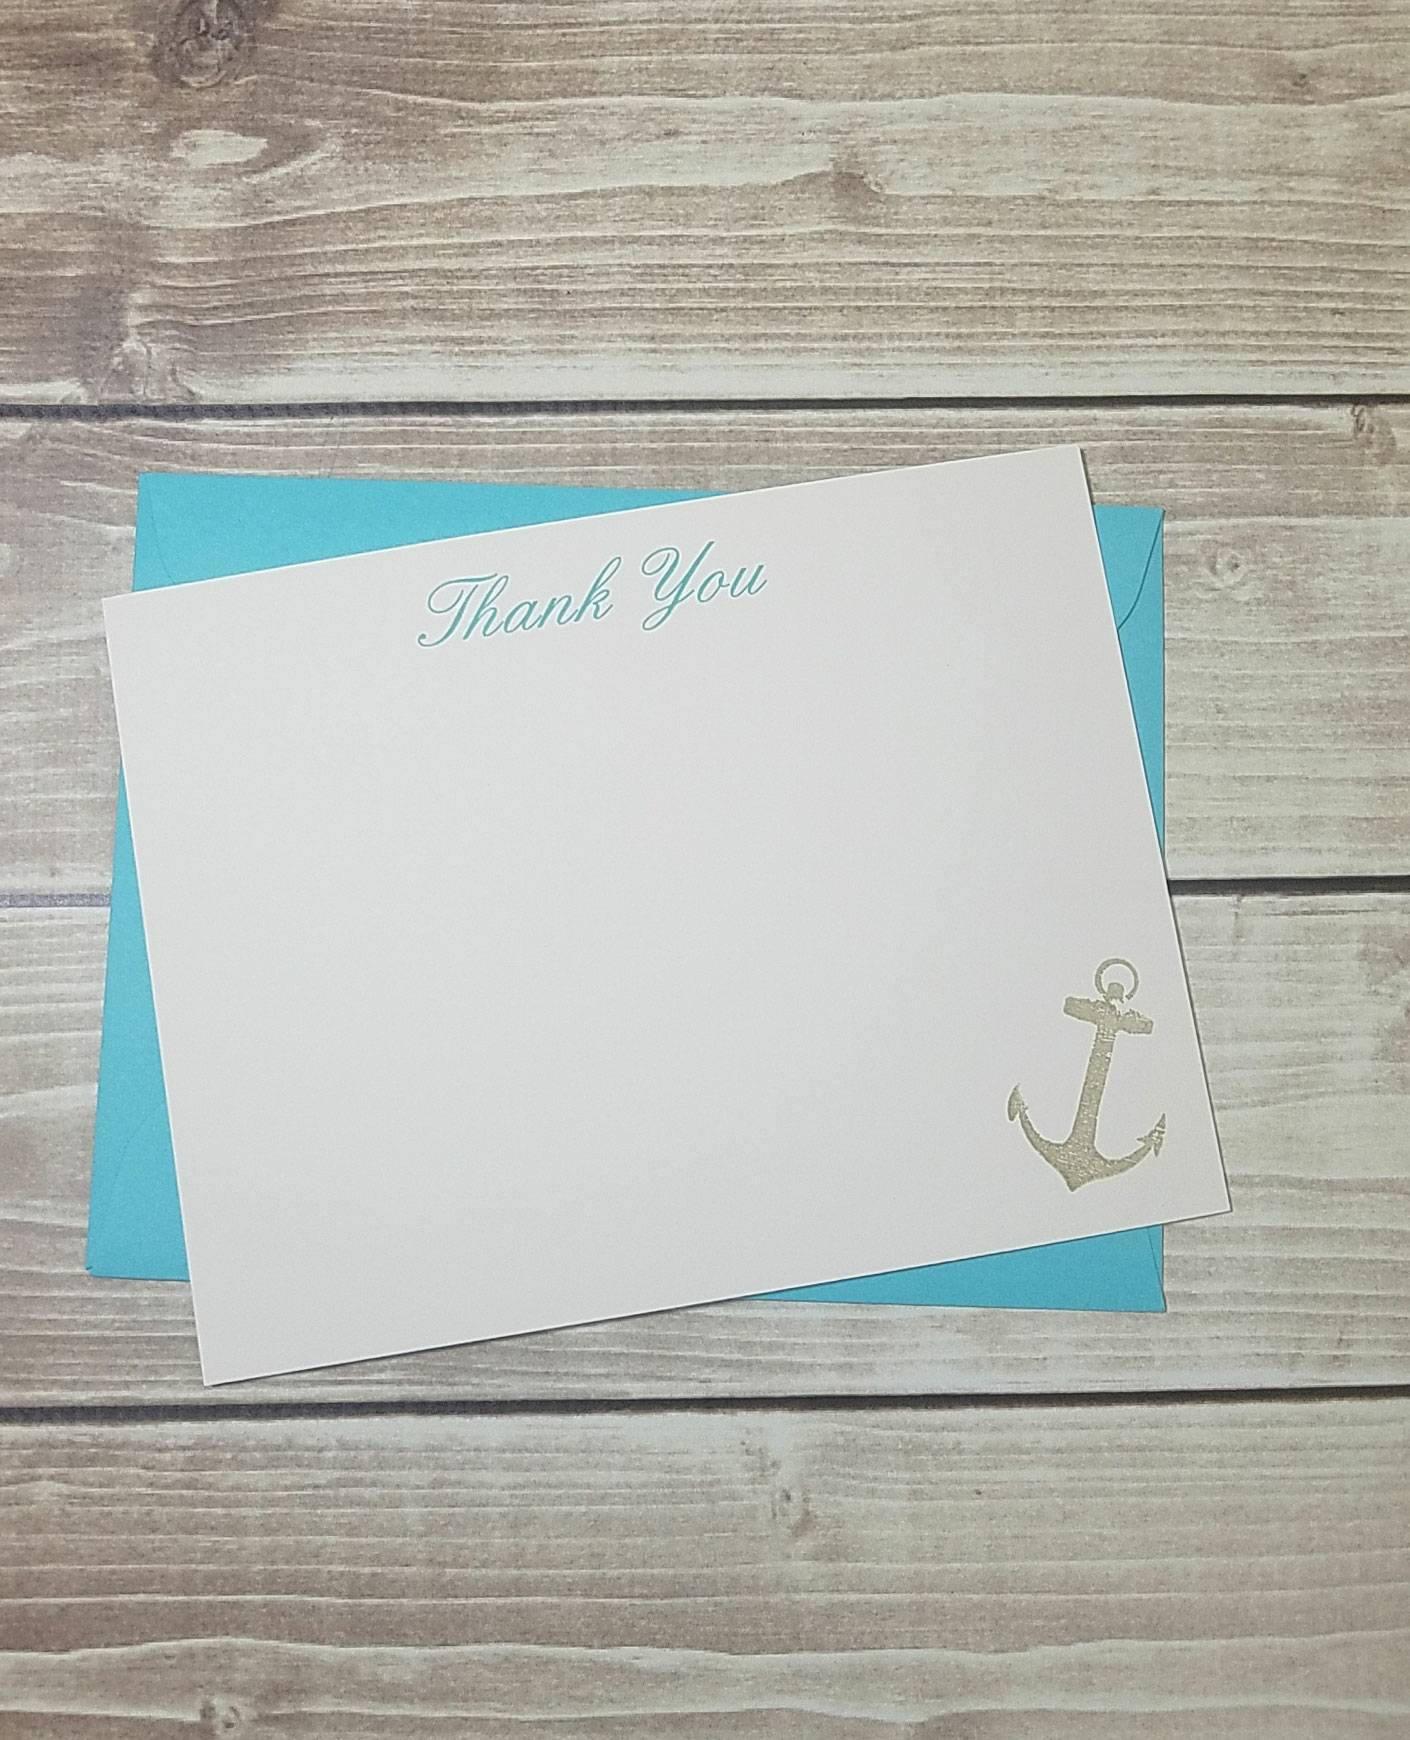 Wedding Thank You Stationery, Beach Stationery, Beach Thank You Note,  Anchor Thank You